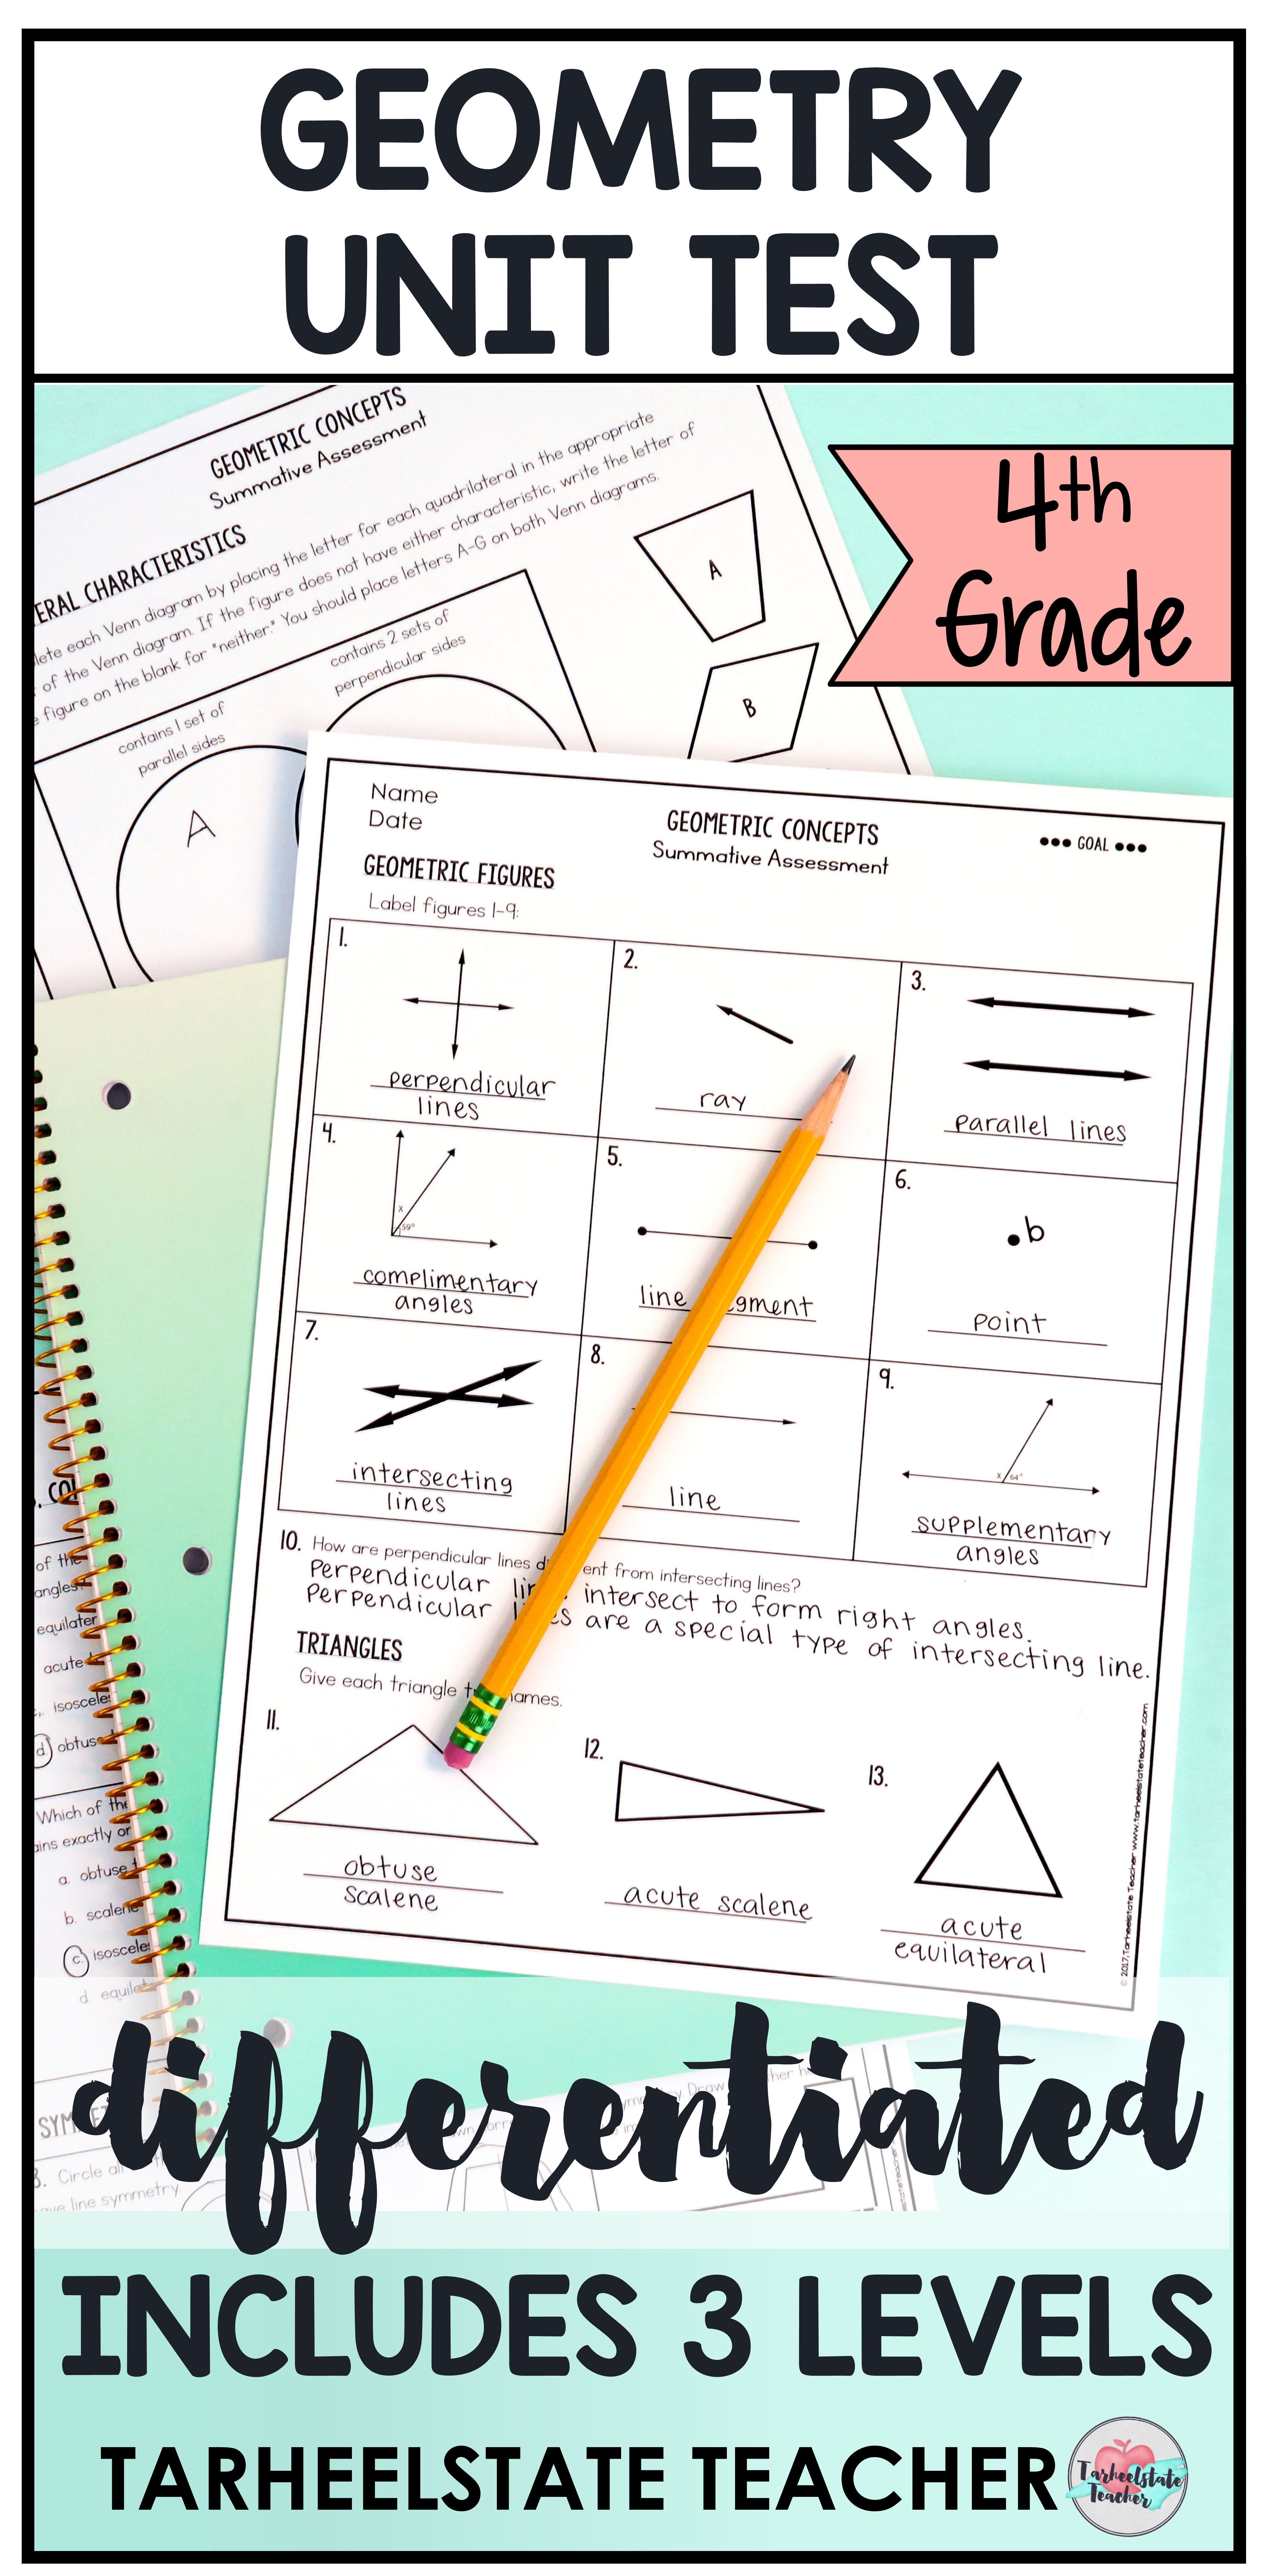 small resolution of Pin on Tarheelstate Teacher Resources